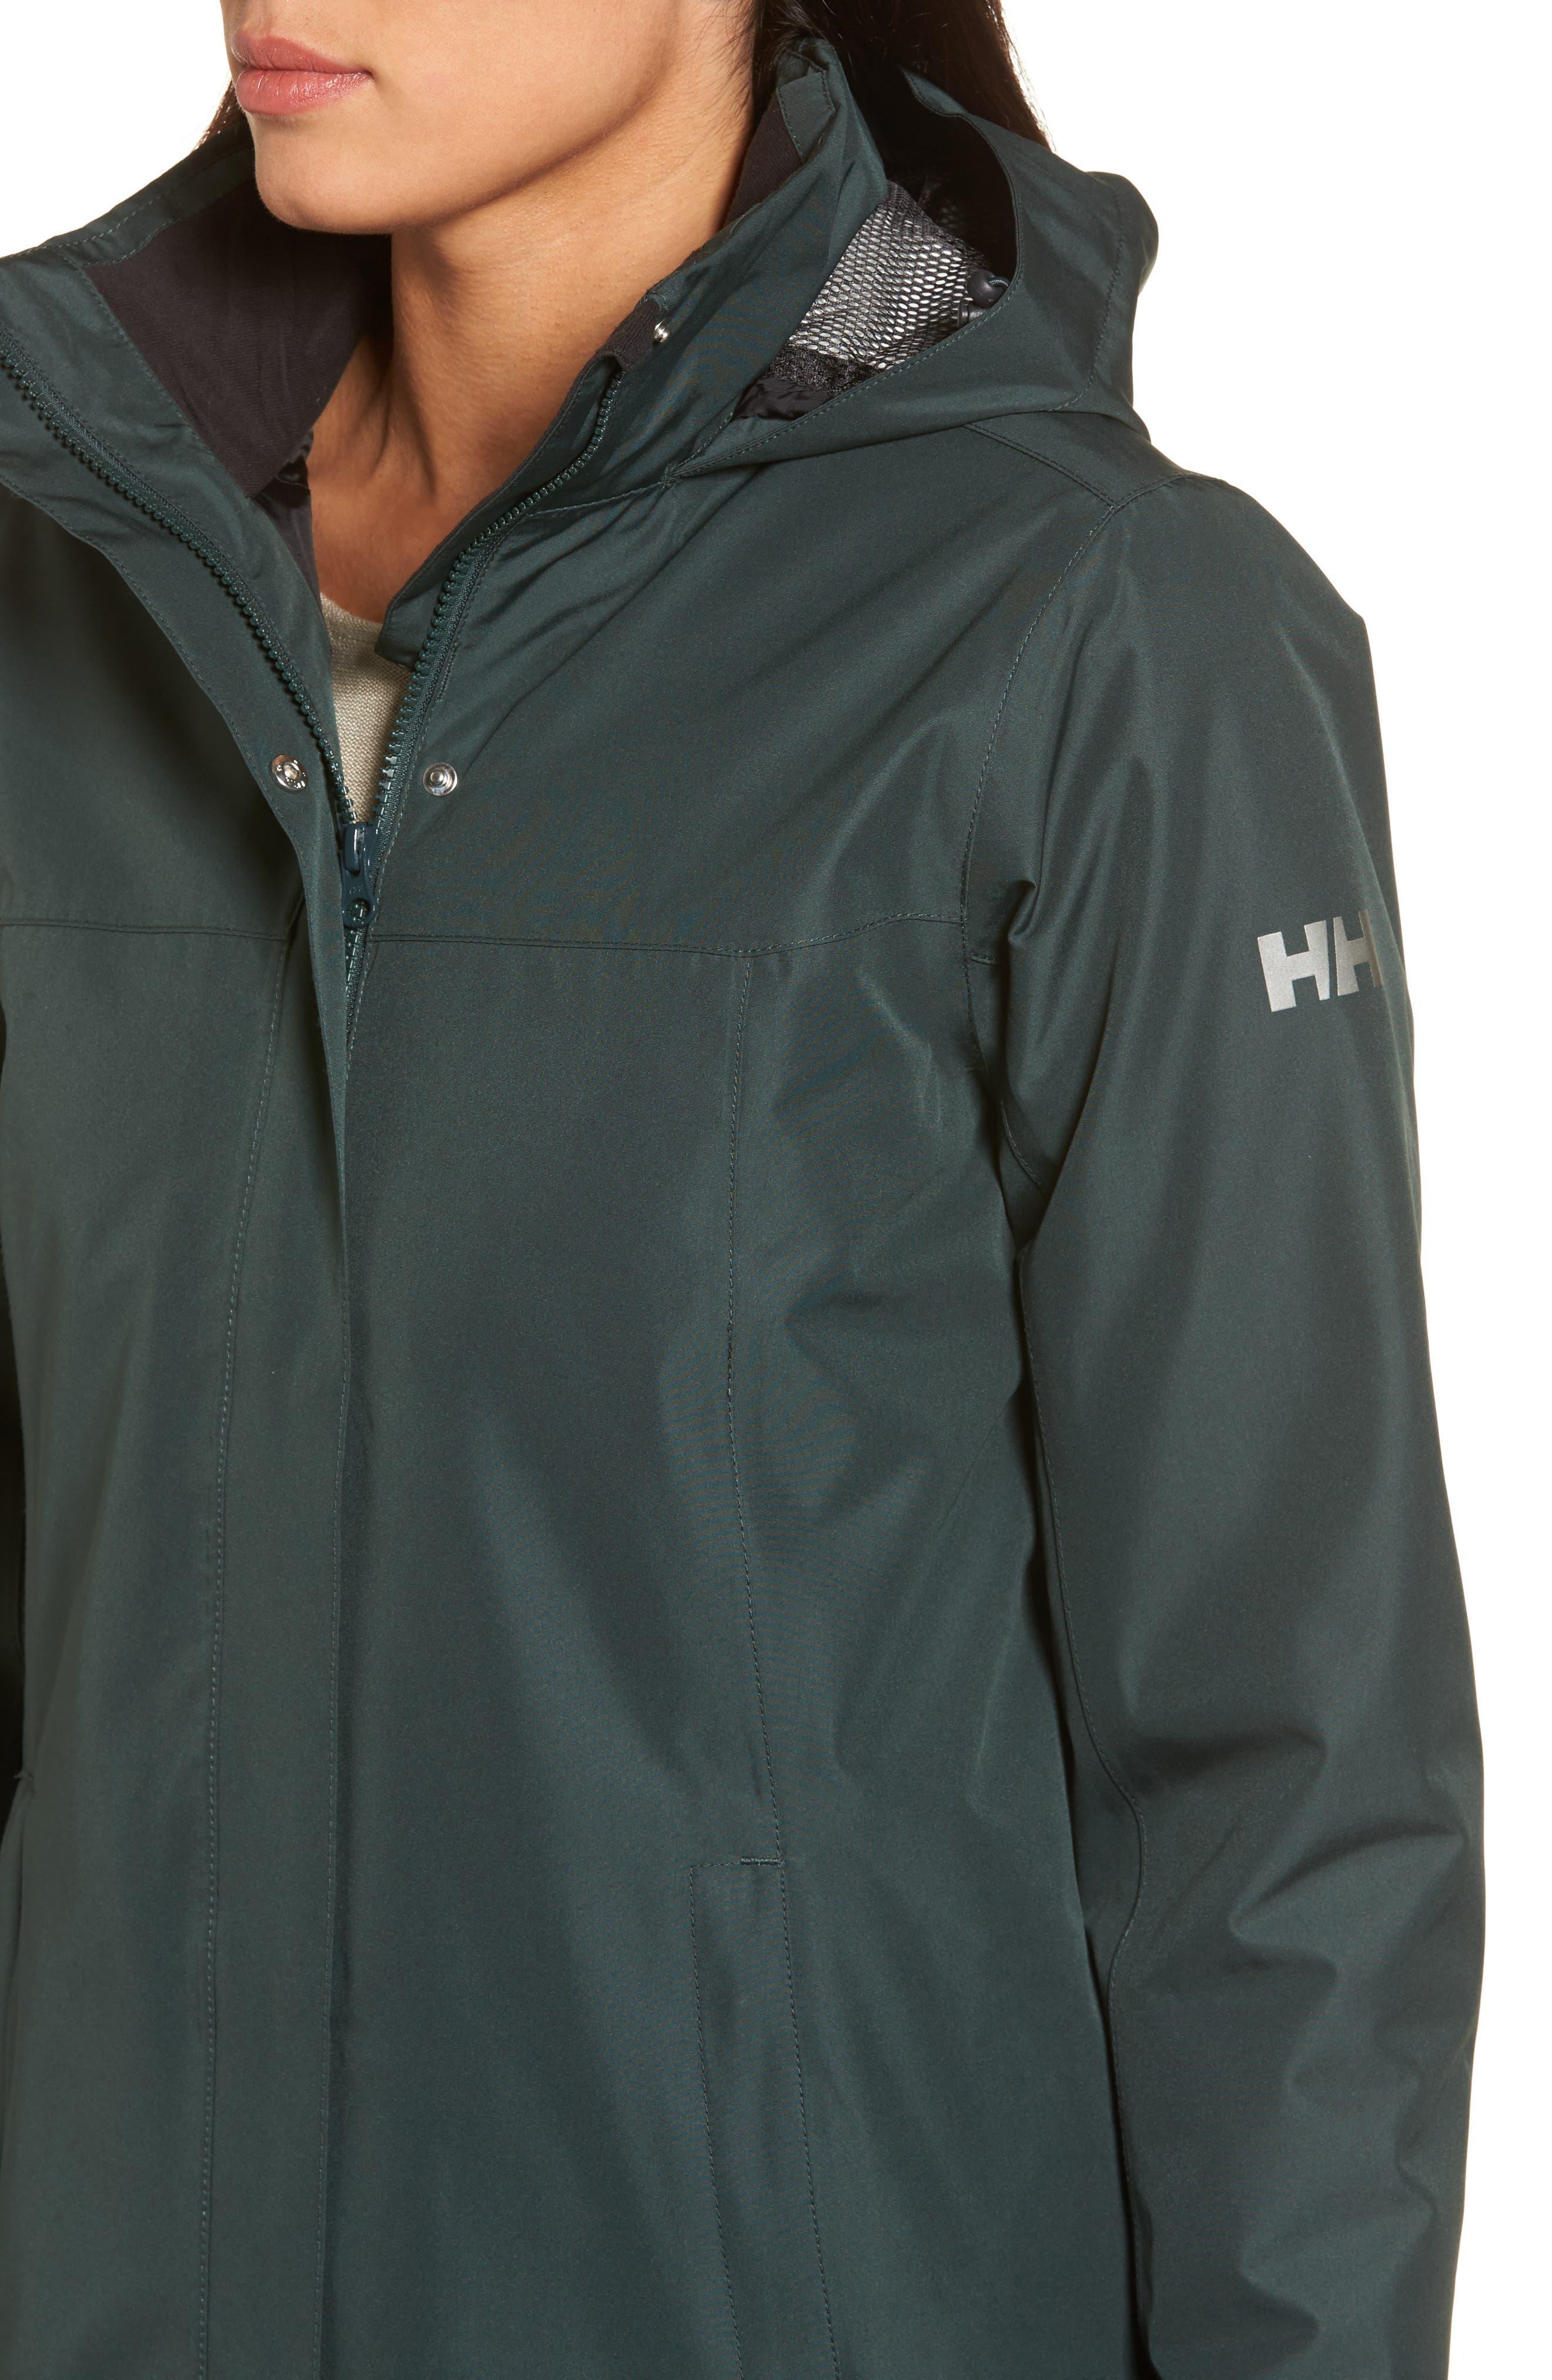 Alternate Image 4  - Helly Hansen Aden Hooded Insulated Rain Jacket